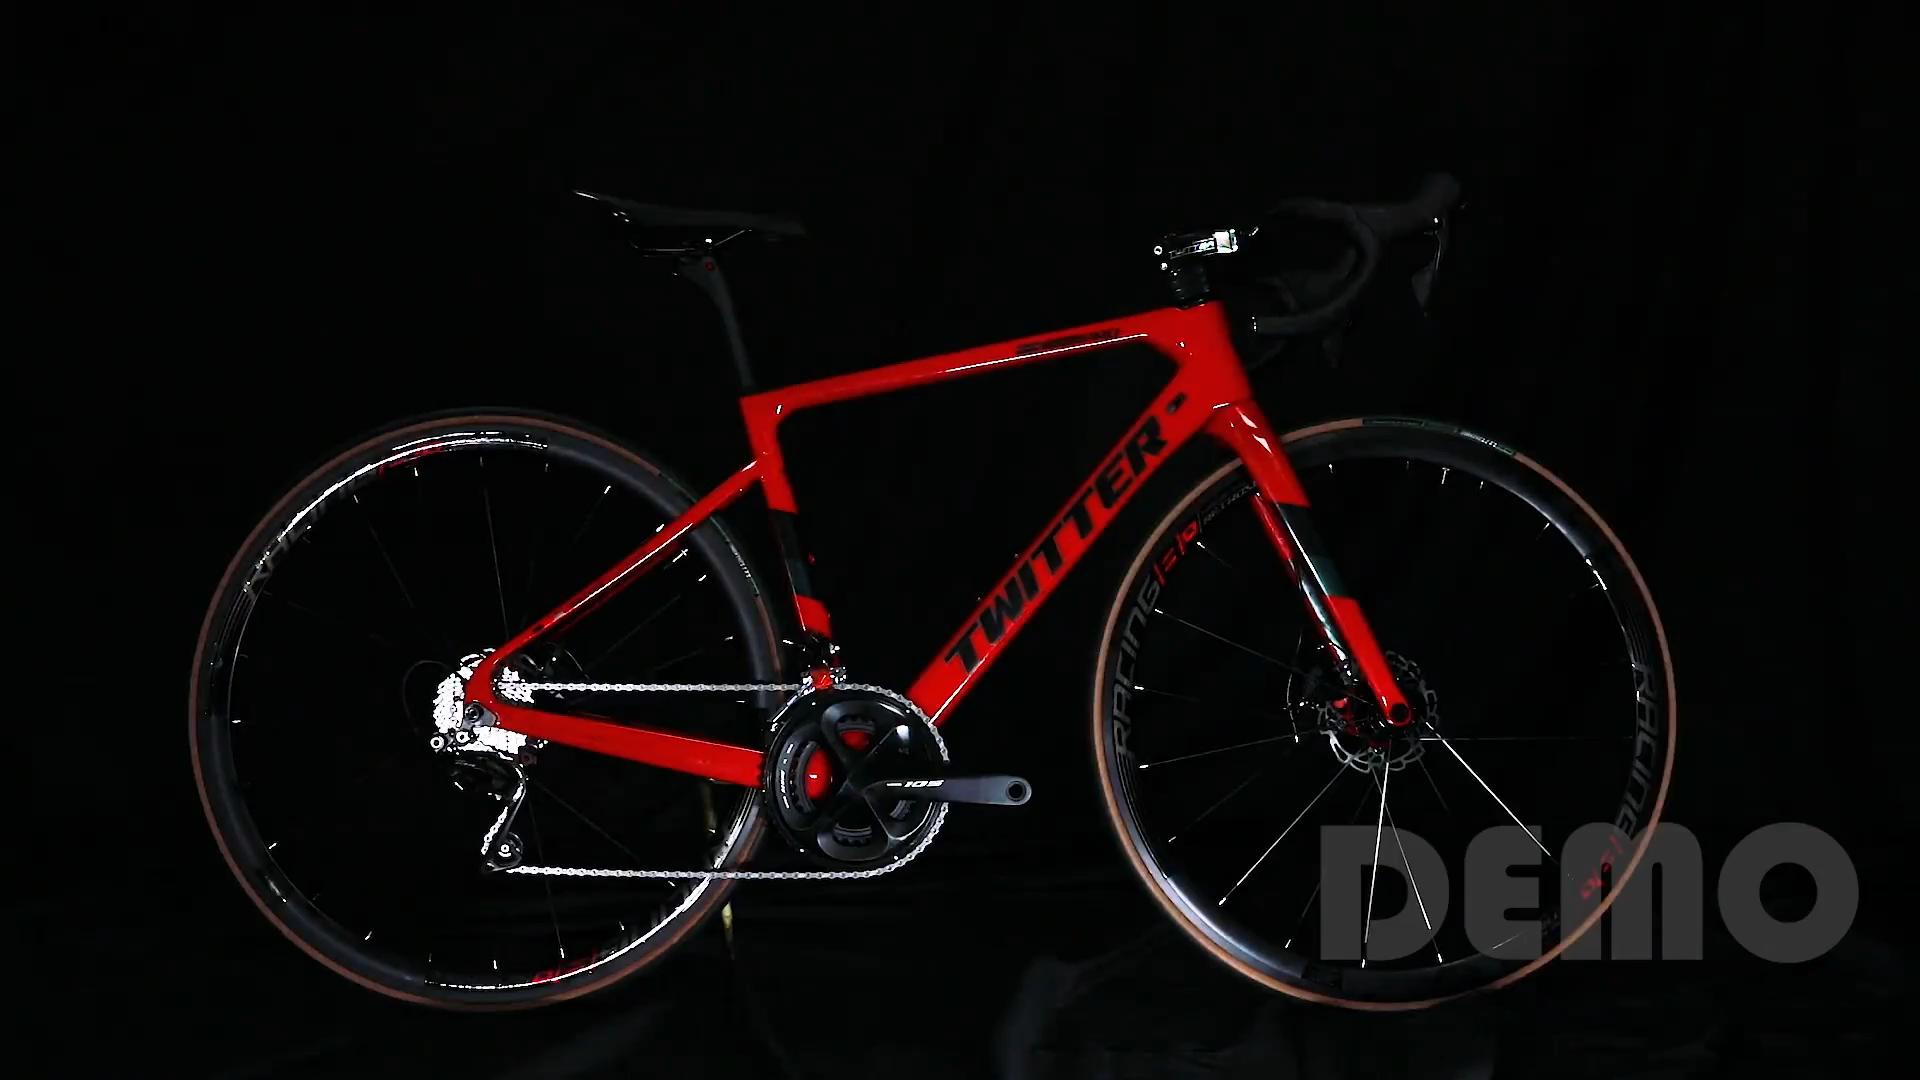 2020 New 700C carbon road bike disc brake thru axle carbon frame 22 speed  road bike bicycle